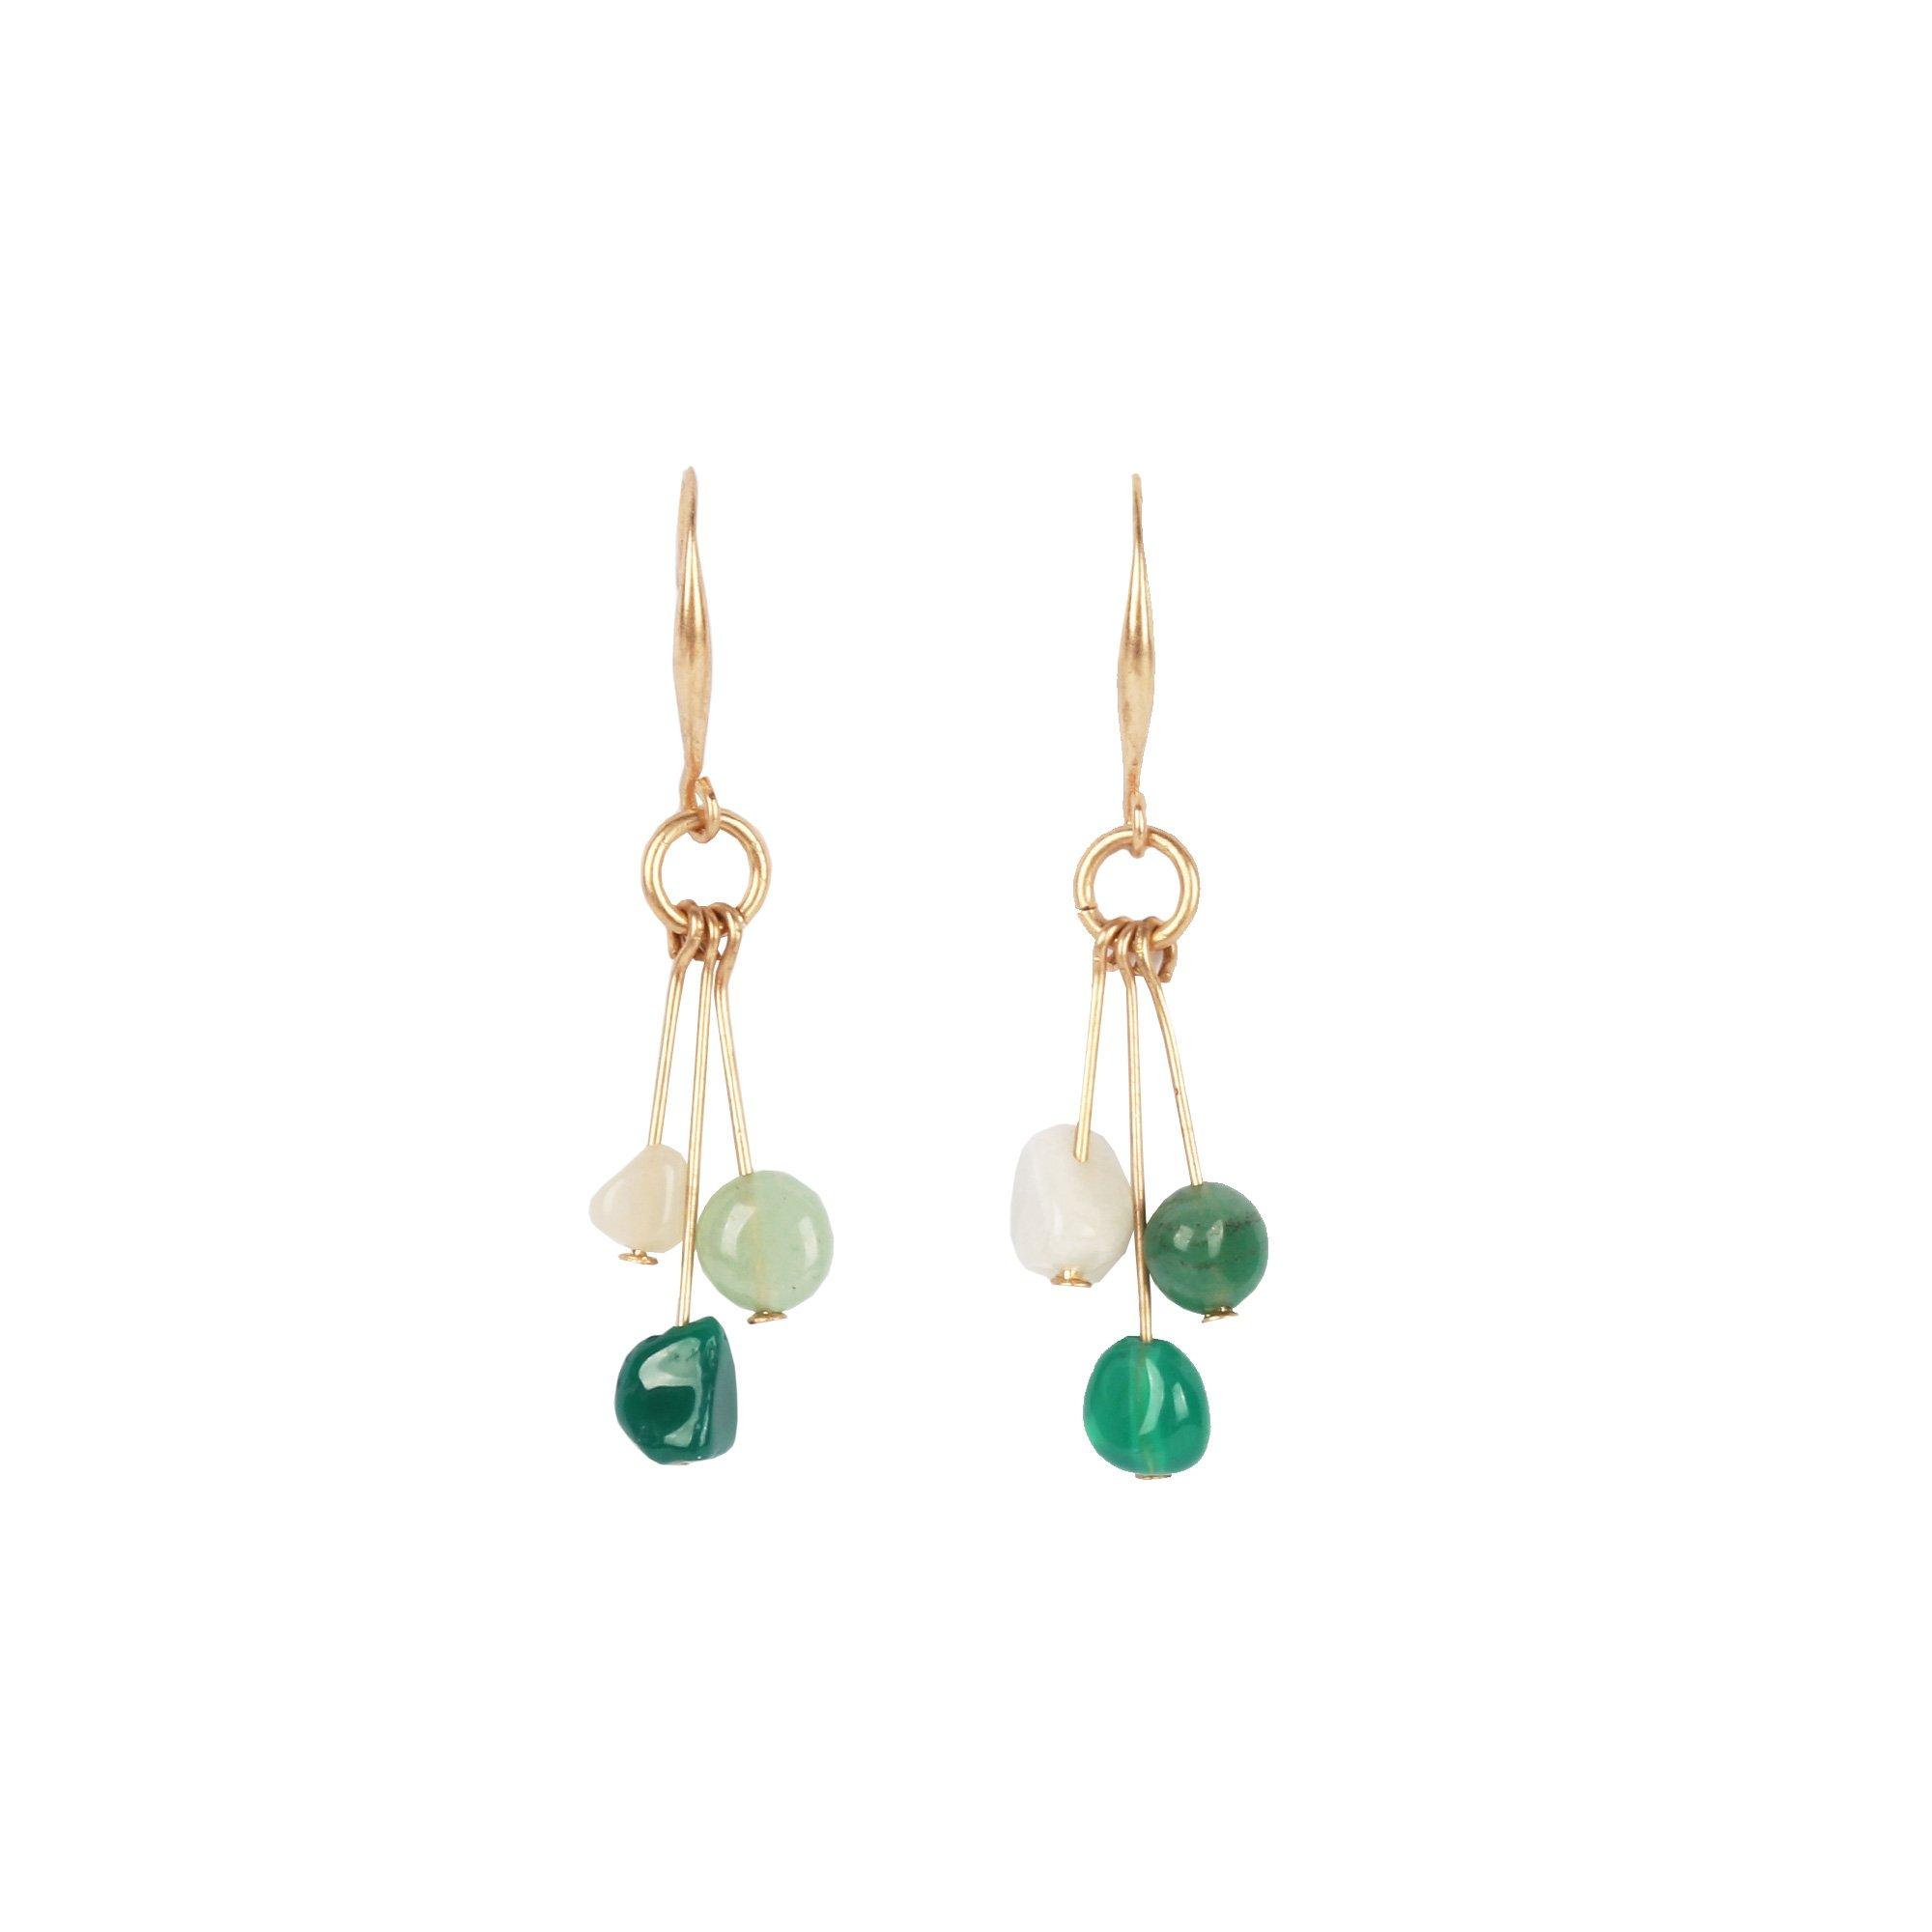 BLING VIOLET Green Stone Flows Elegant Drop Earrings, Nickel Free Jewelry for Women,Girls